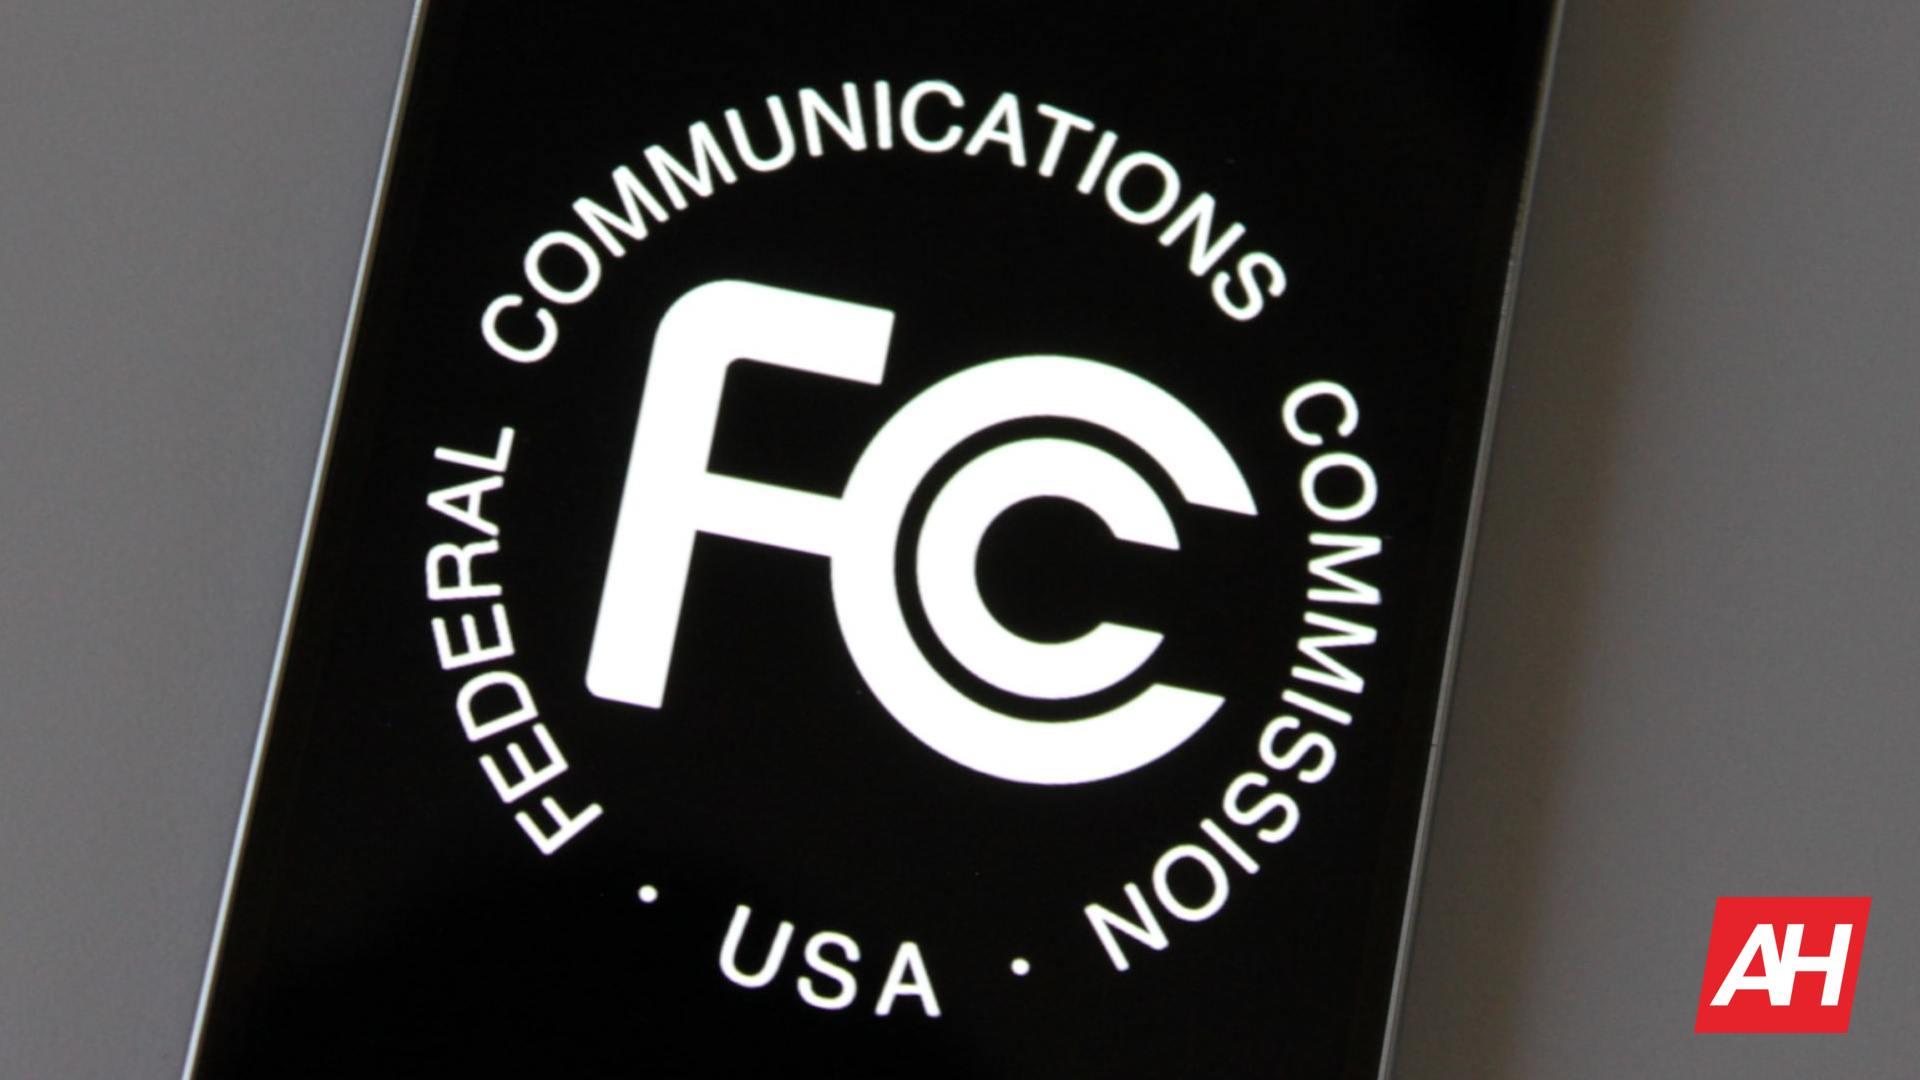 Congress Makes Sure Net Neutrality Stays Dead, FCC's Pai Takes Victory Lap